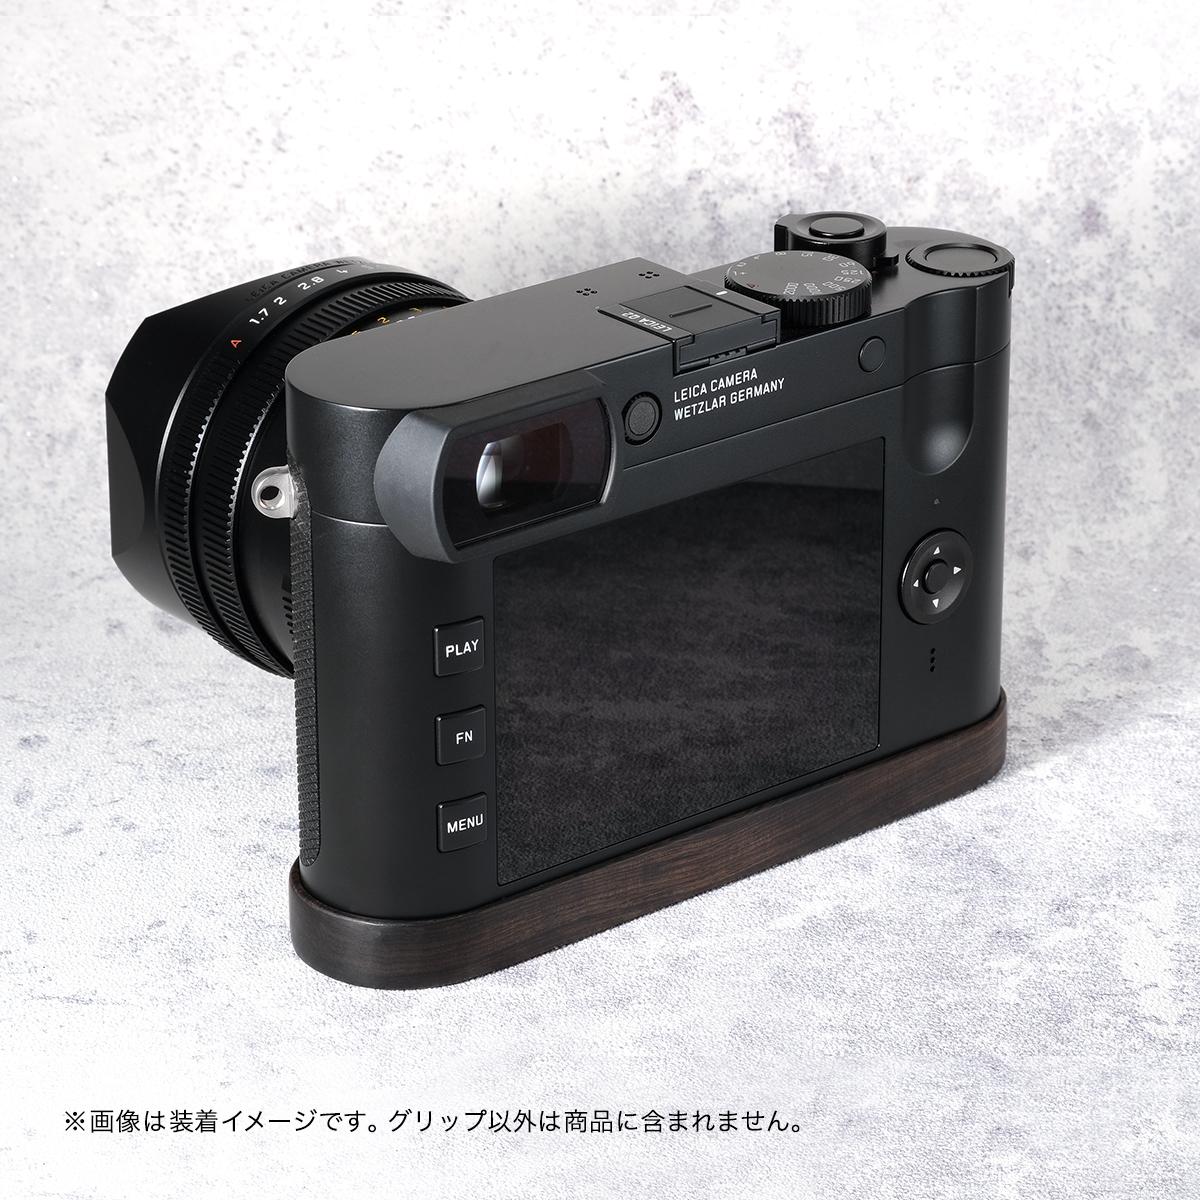 SHOTEN カメラウッドグリップ Q2-GP|LEICA Q2 用